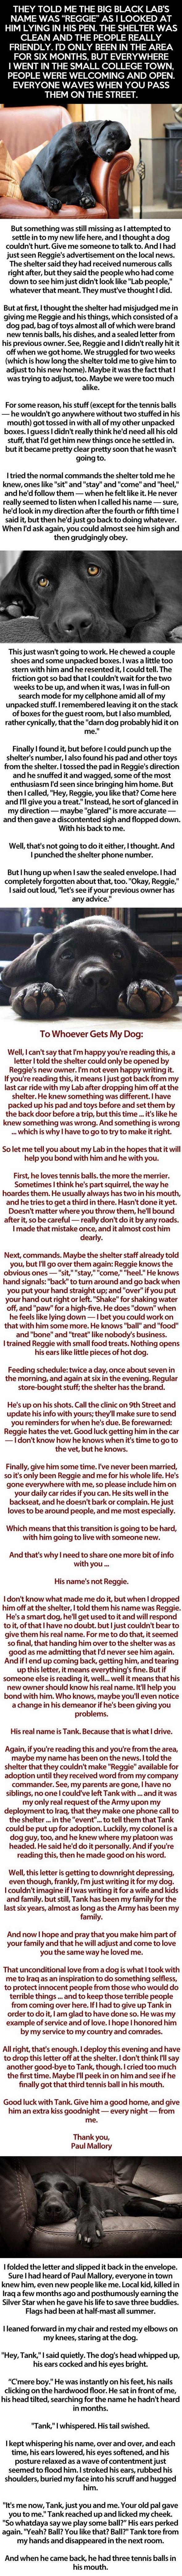 Feel dog story. I cried a bit.